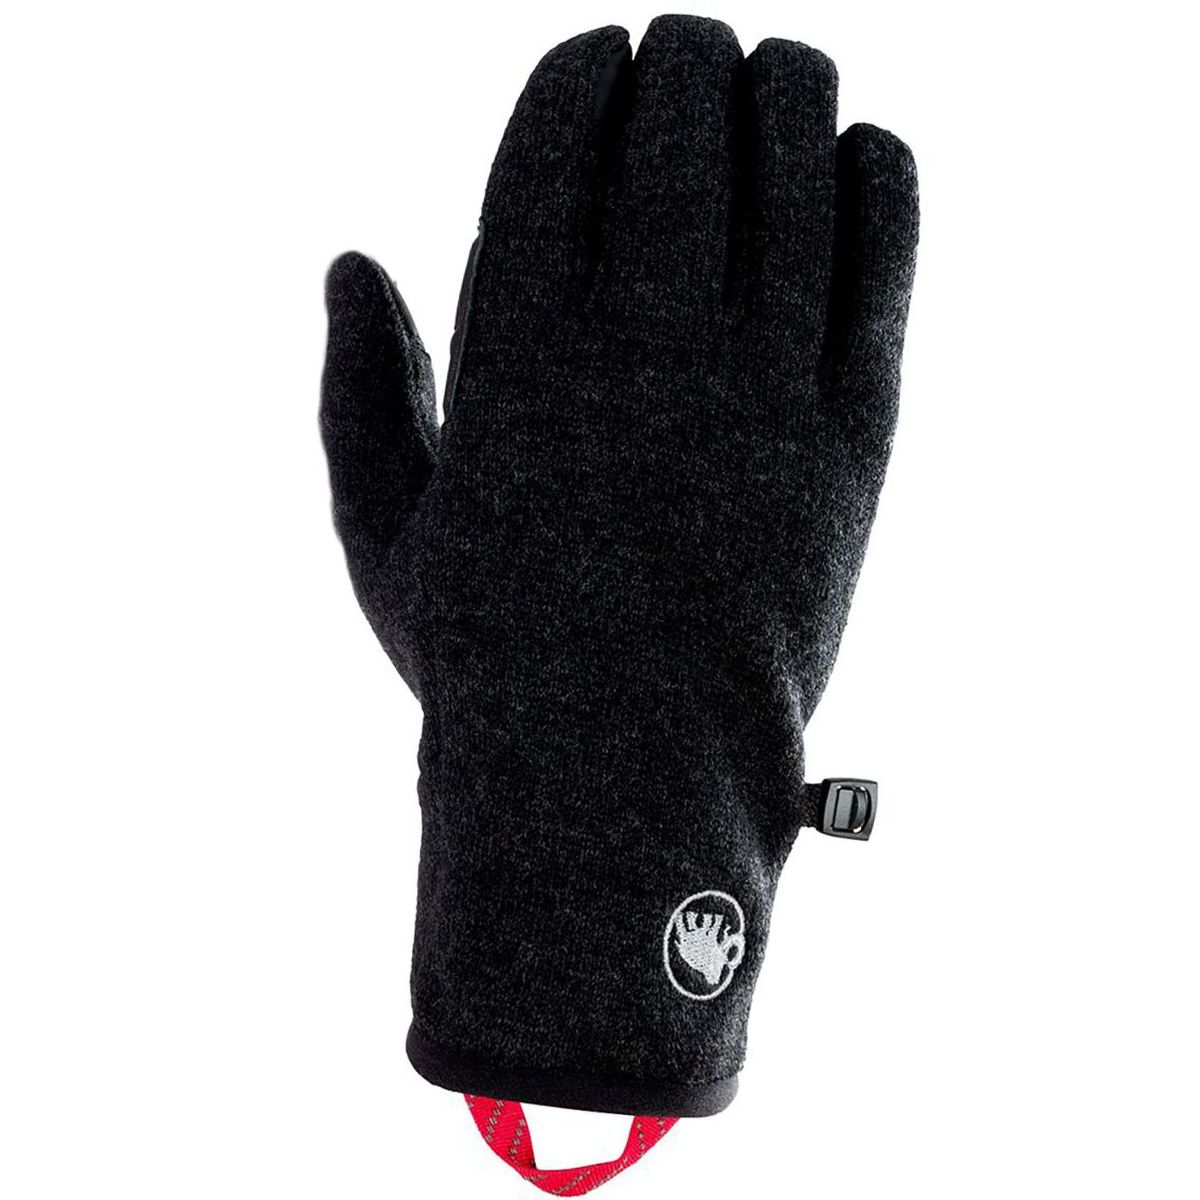 Mammut Passion Light Glove - Men's